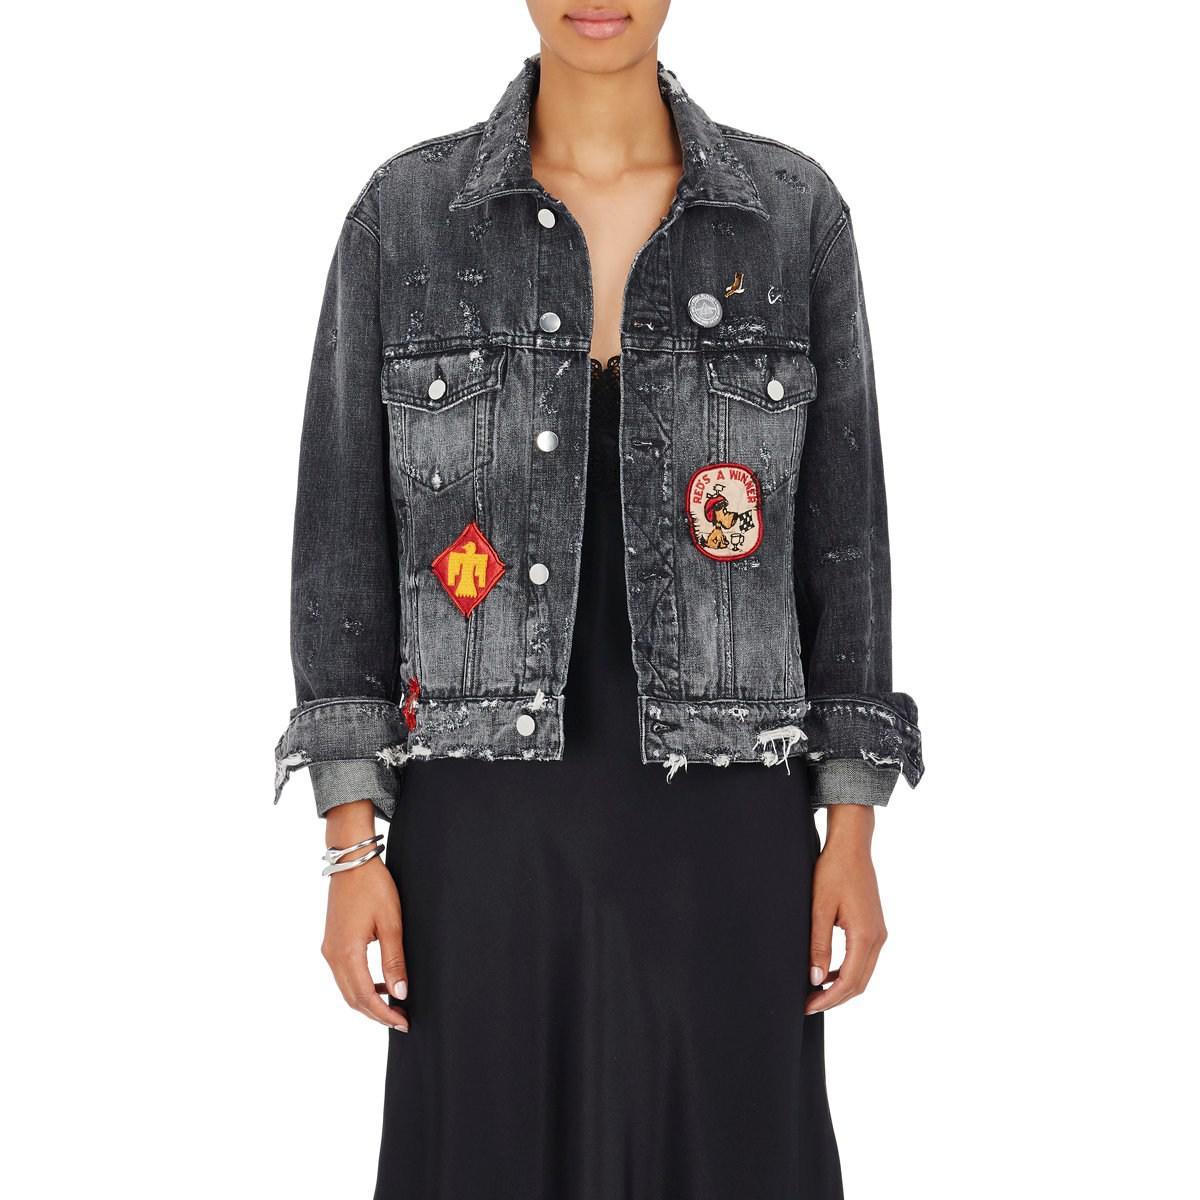 25b693d9fdf9 Amiri Denim Distressed Patchwork Black Jacket Women s H0rqH